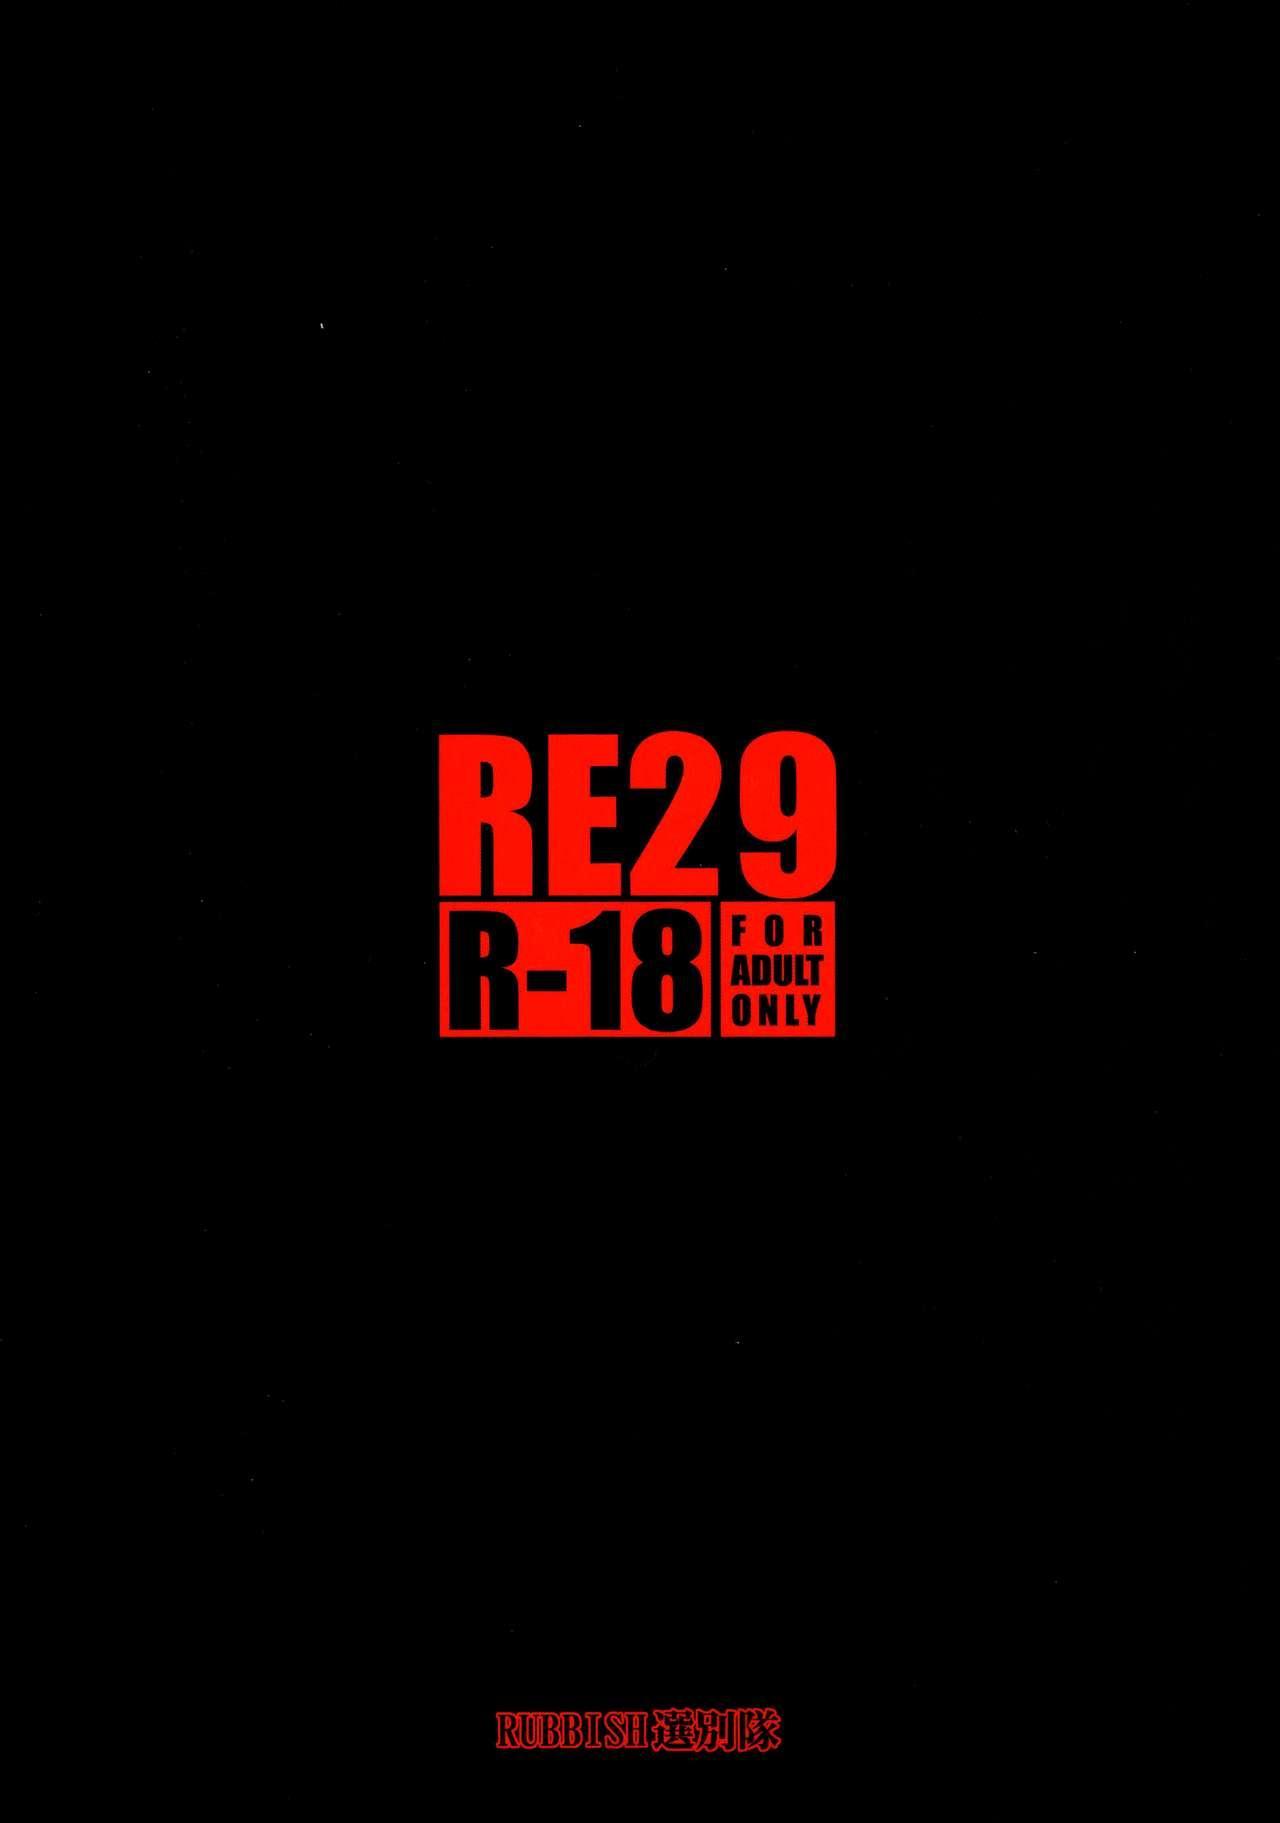 RE29 34